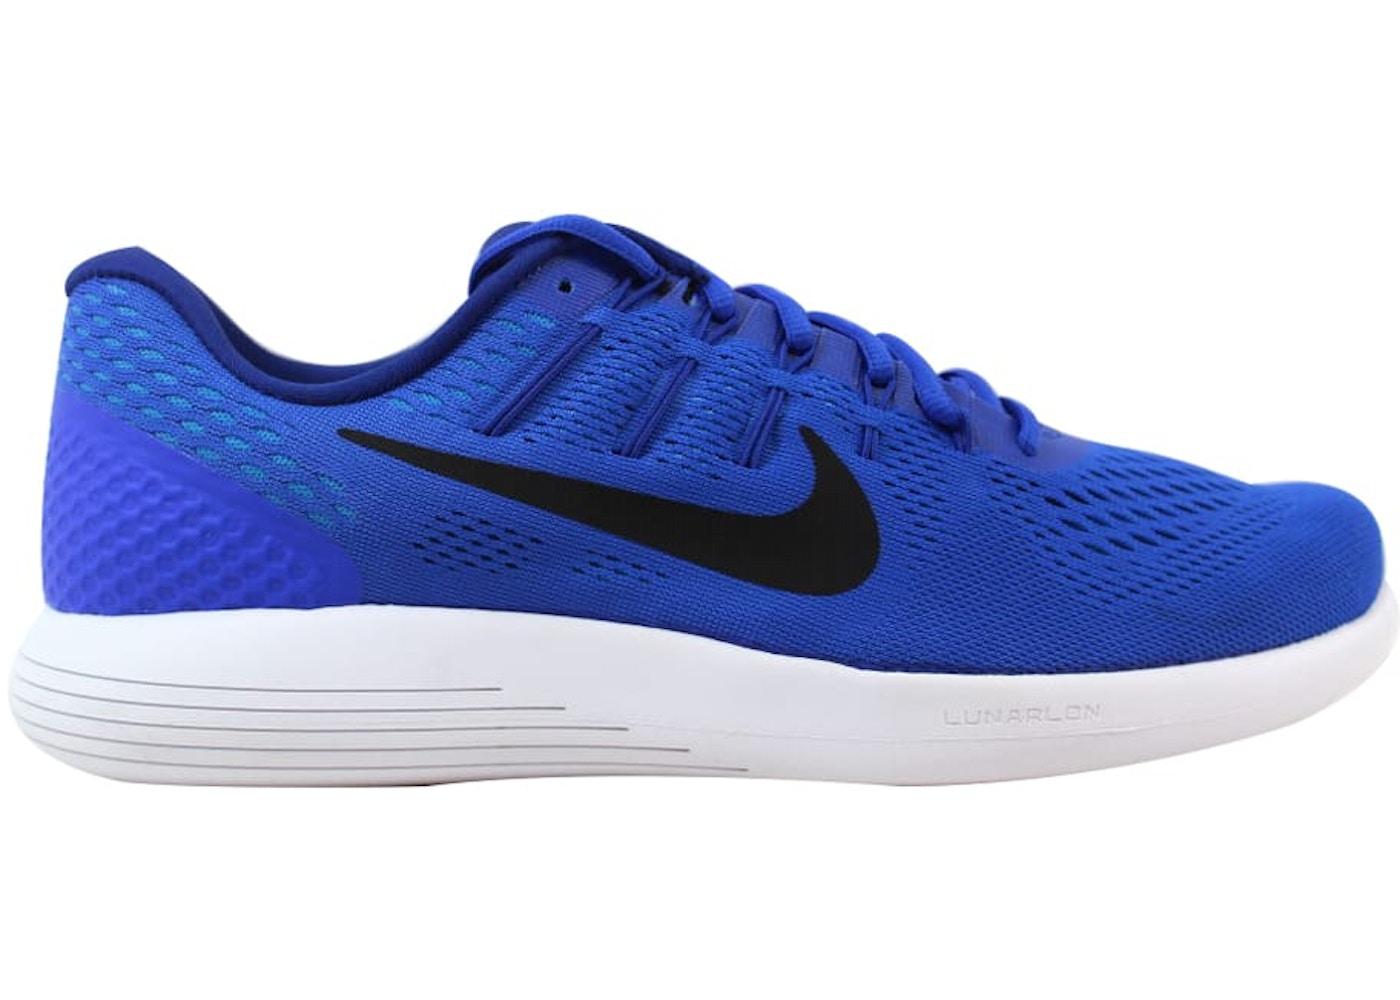 best authentic ccf40 3f8f4 Nike Lunarglide 8 Racer Blue/Black